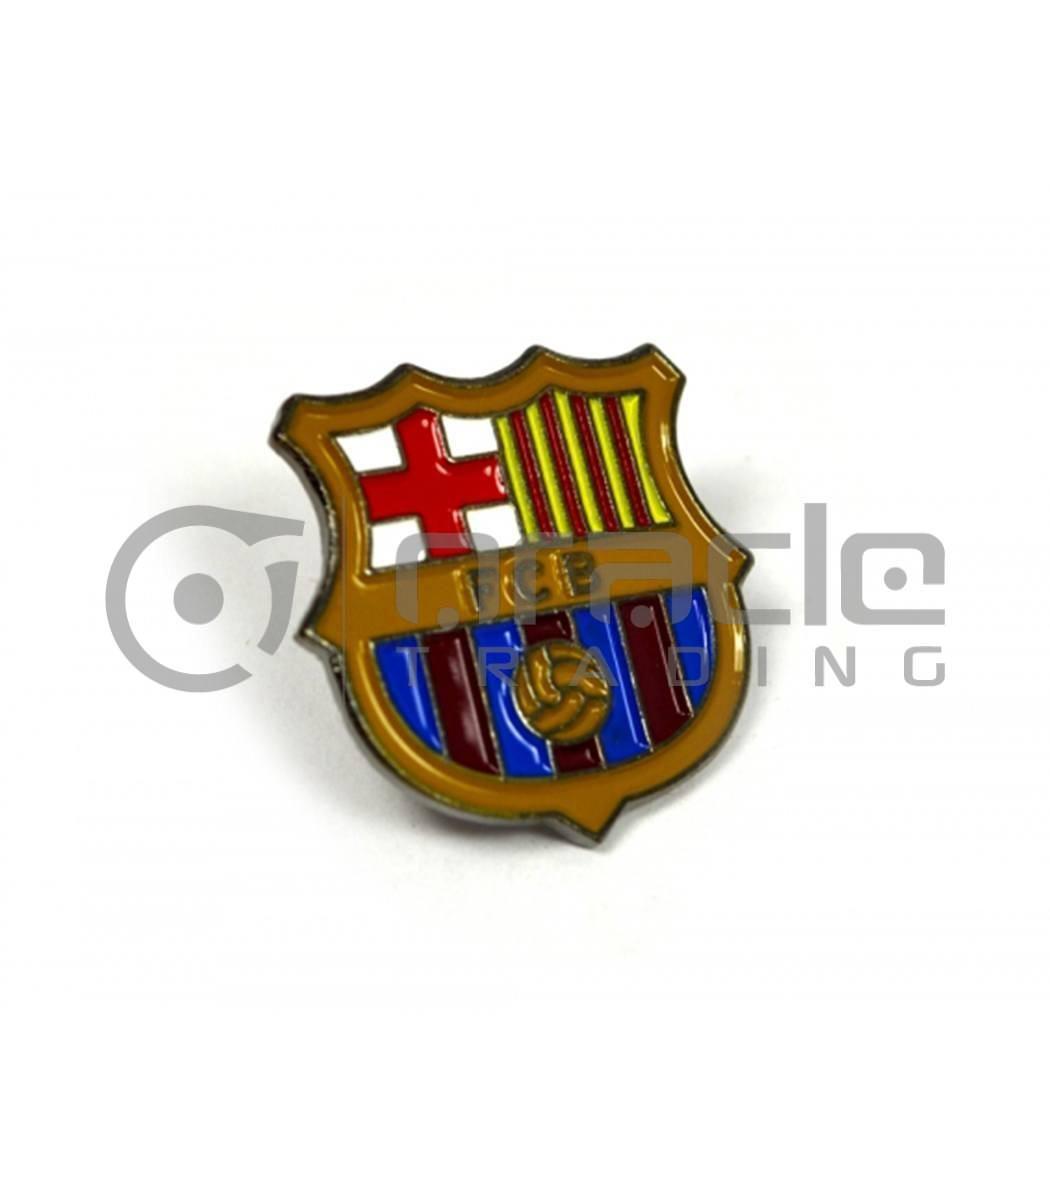 Barcelona Crest Pin